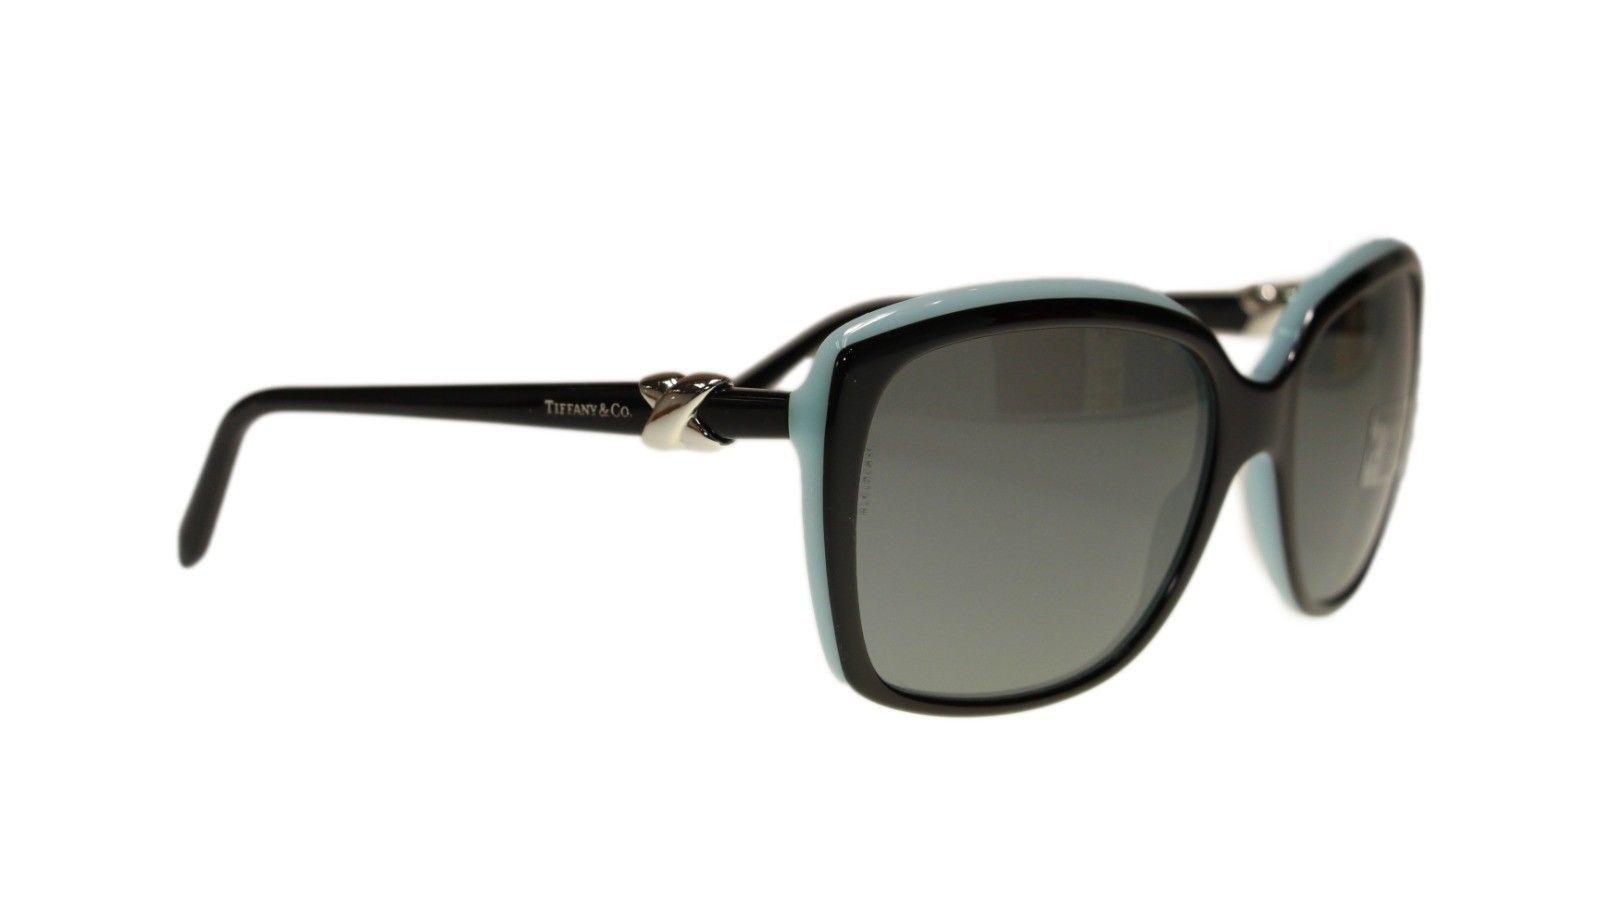 35574594ee52 Tiffany TF4076 80553F Top Black Blue Square Women s Sunglasses 58mm  Authentic